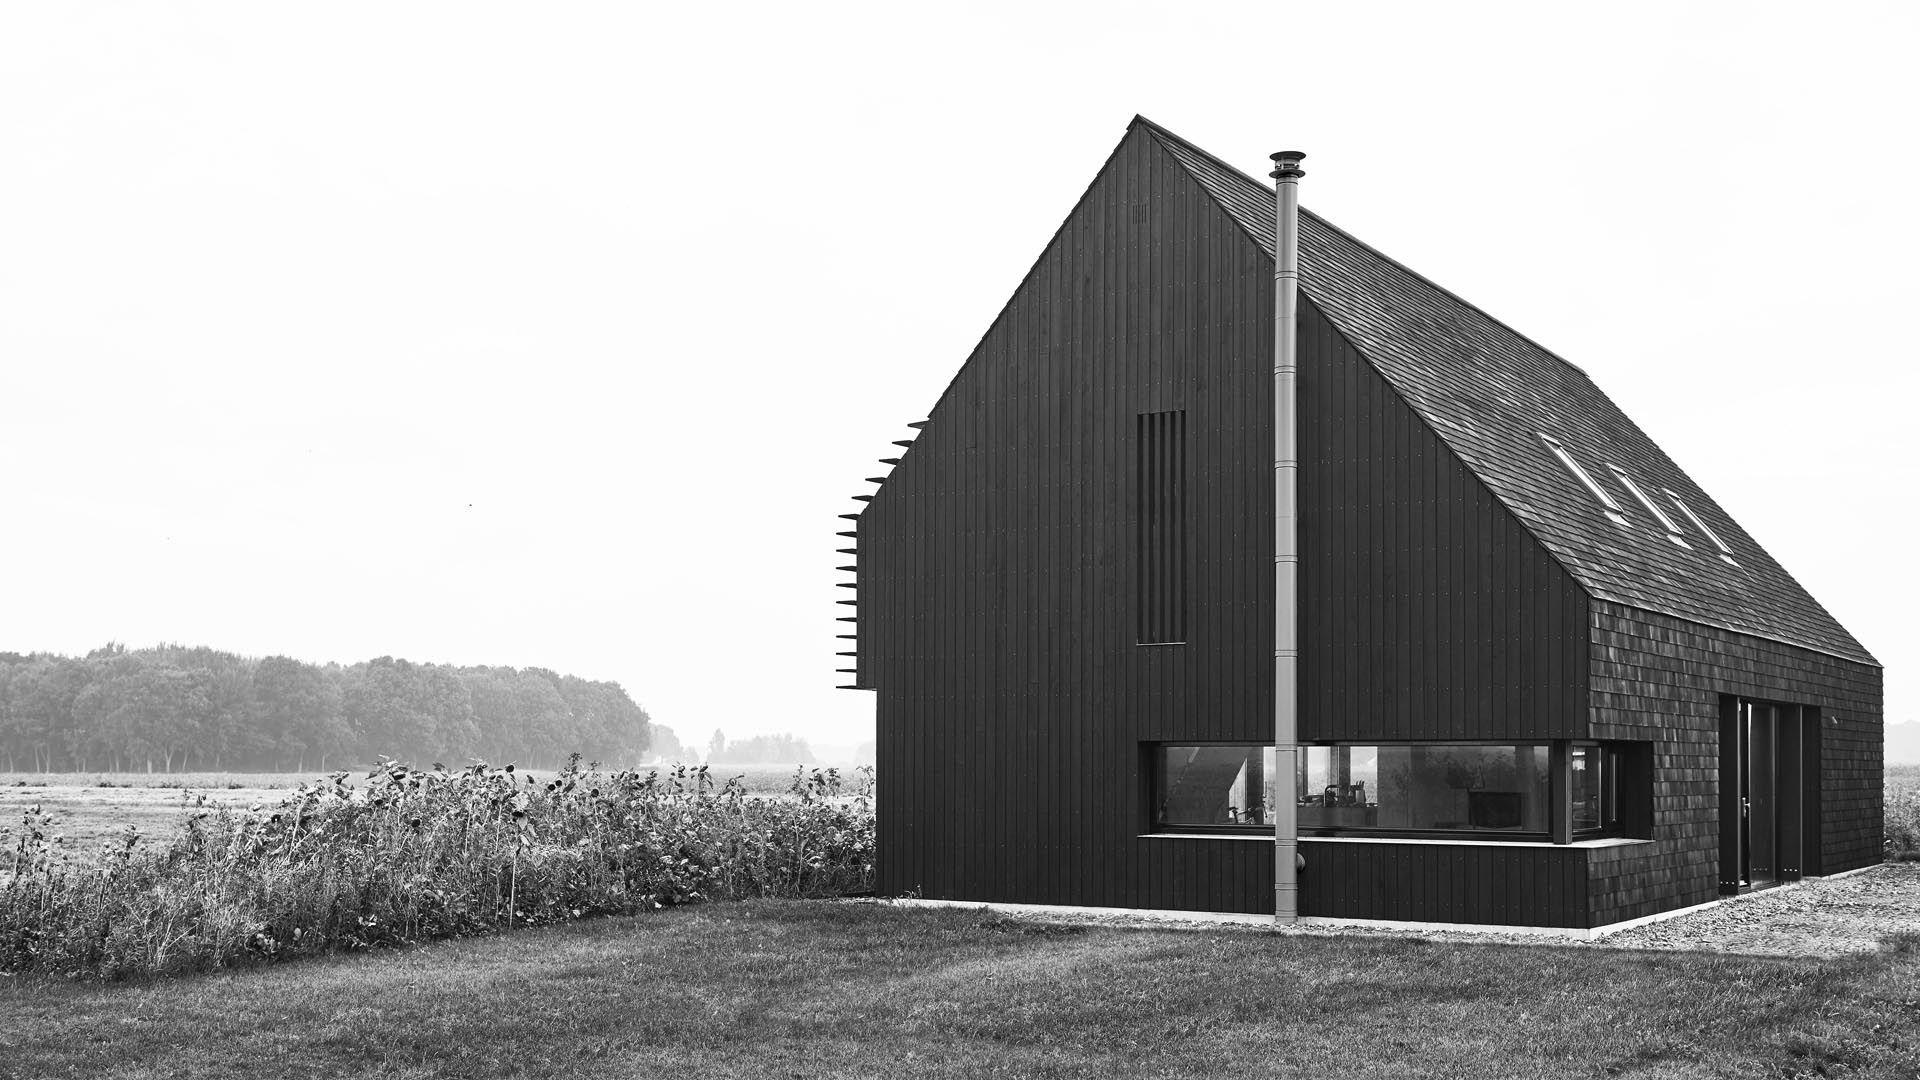 Schuurwoning paterswolde barn house schuur huis zwart black hout modern schuurwoning - Exterieur ingang eigentijds huis ...